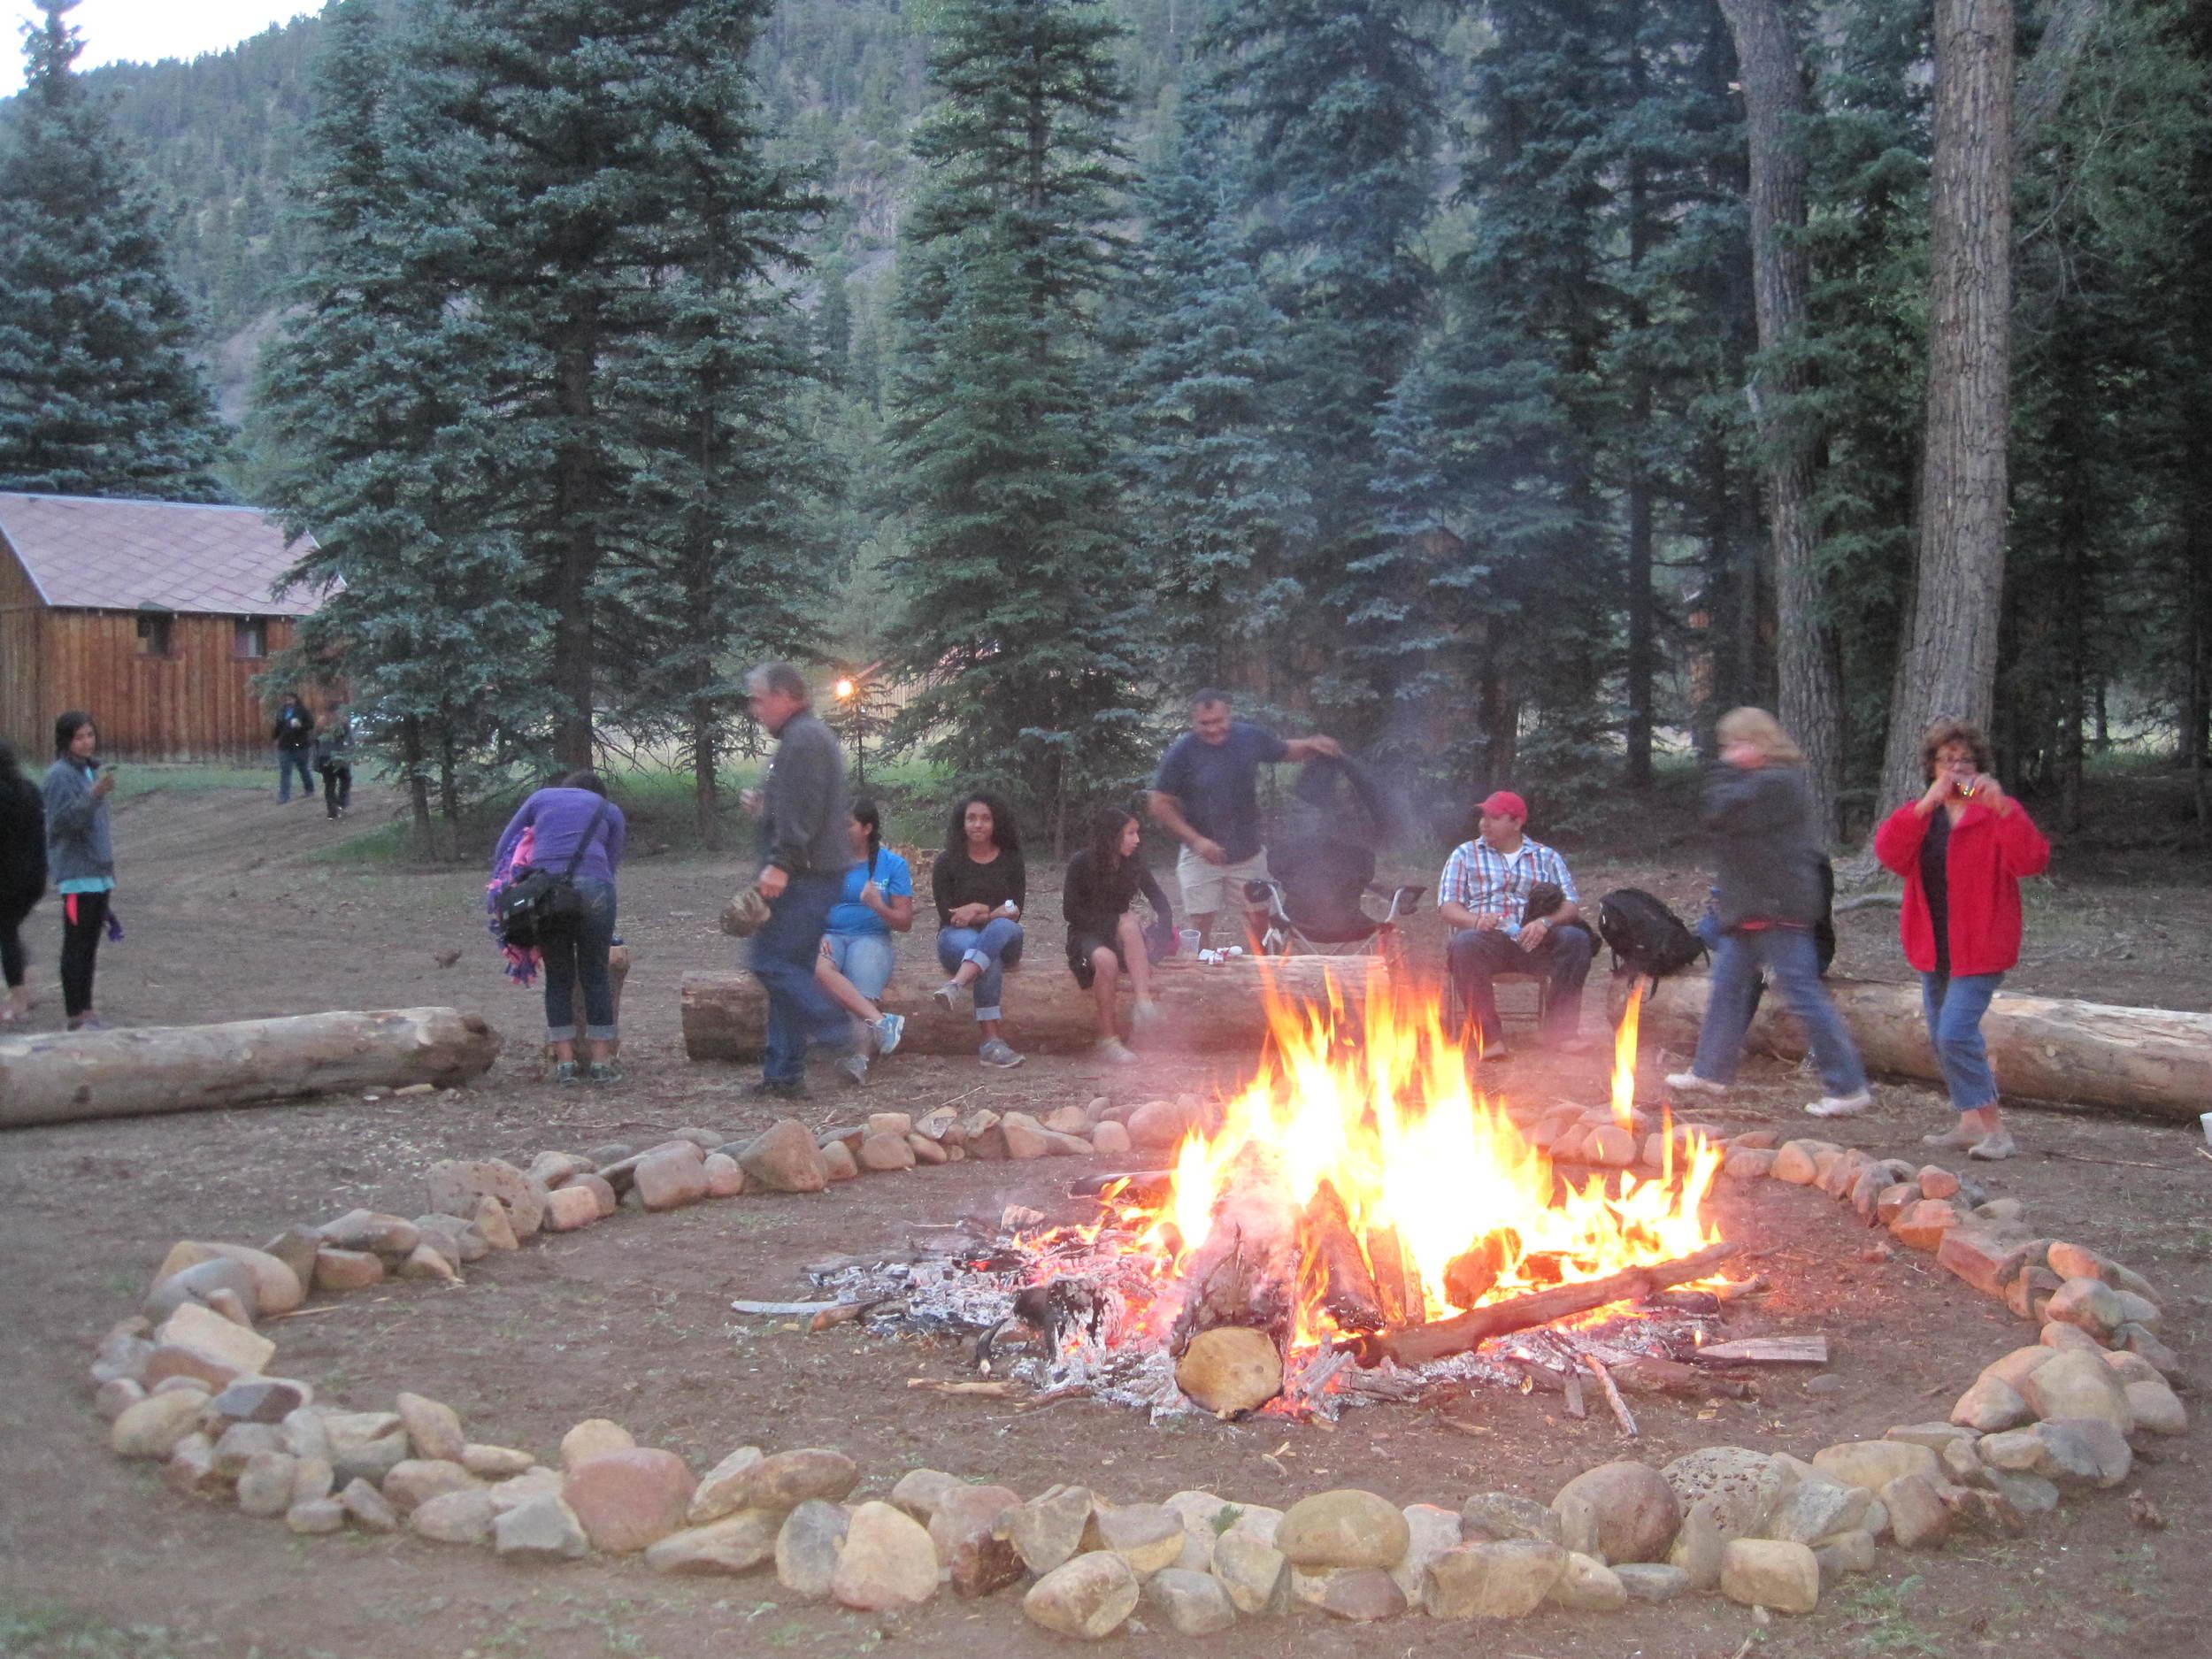 Fellowship around the campfire